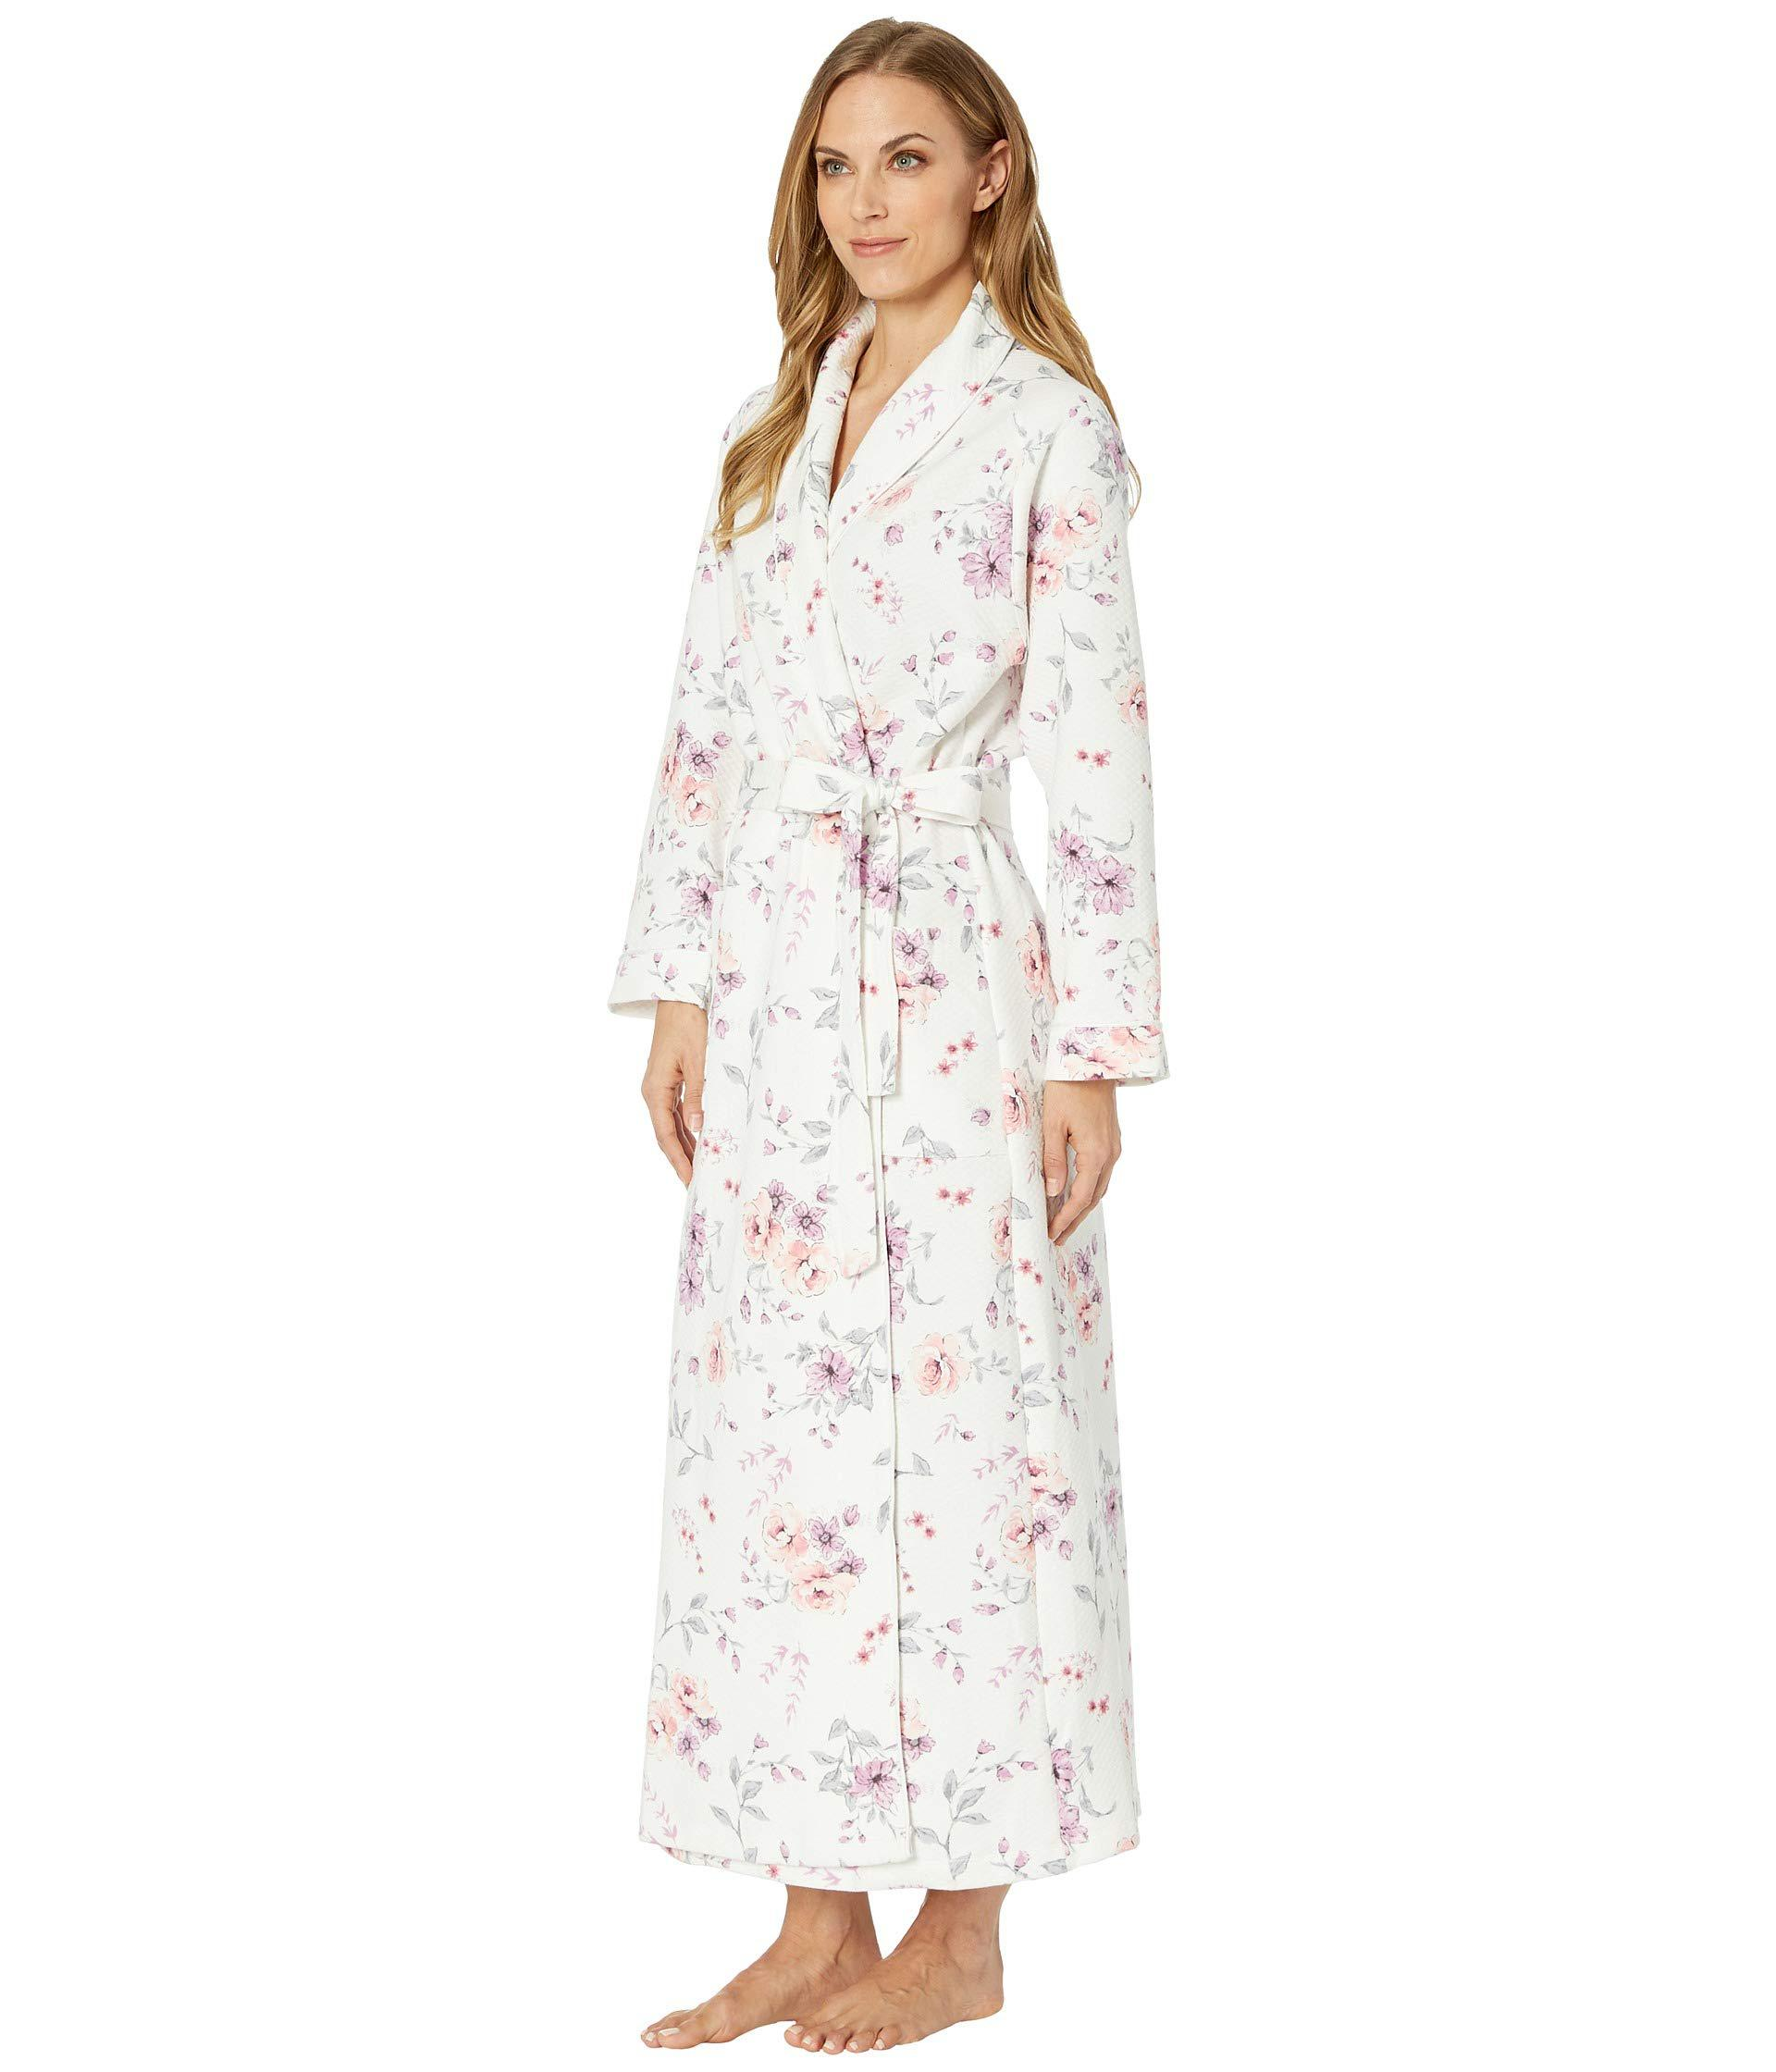 Lyst - Carole Hochman Diamond Quilt Wrap Robe (multi Rose Floral) Women s  Robe 37c0a7437